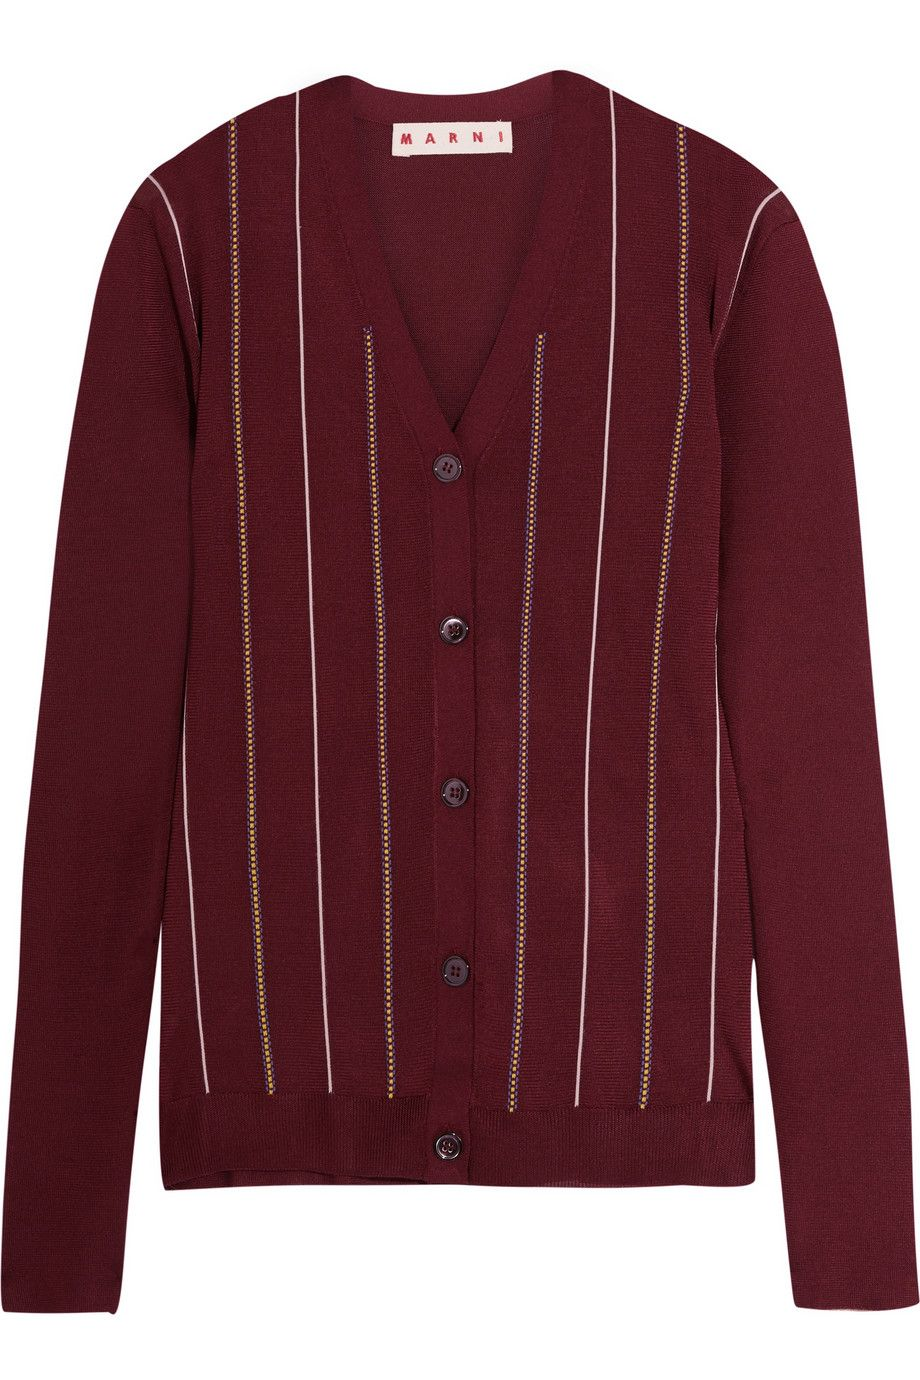 Marni   Embroidered striped silk-blend cardigan   NET-A-PORTER.COM